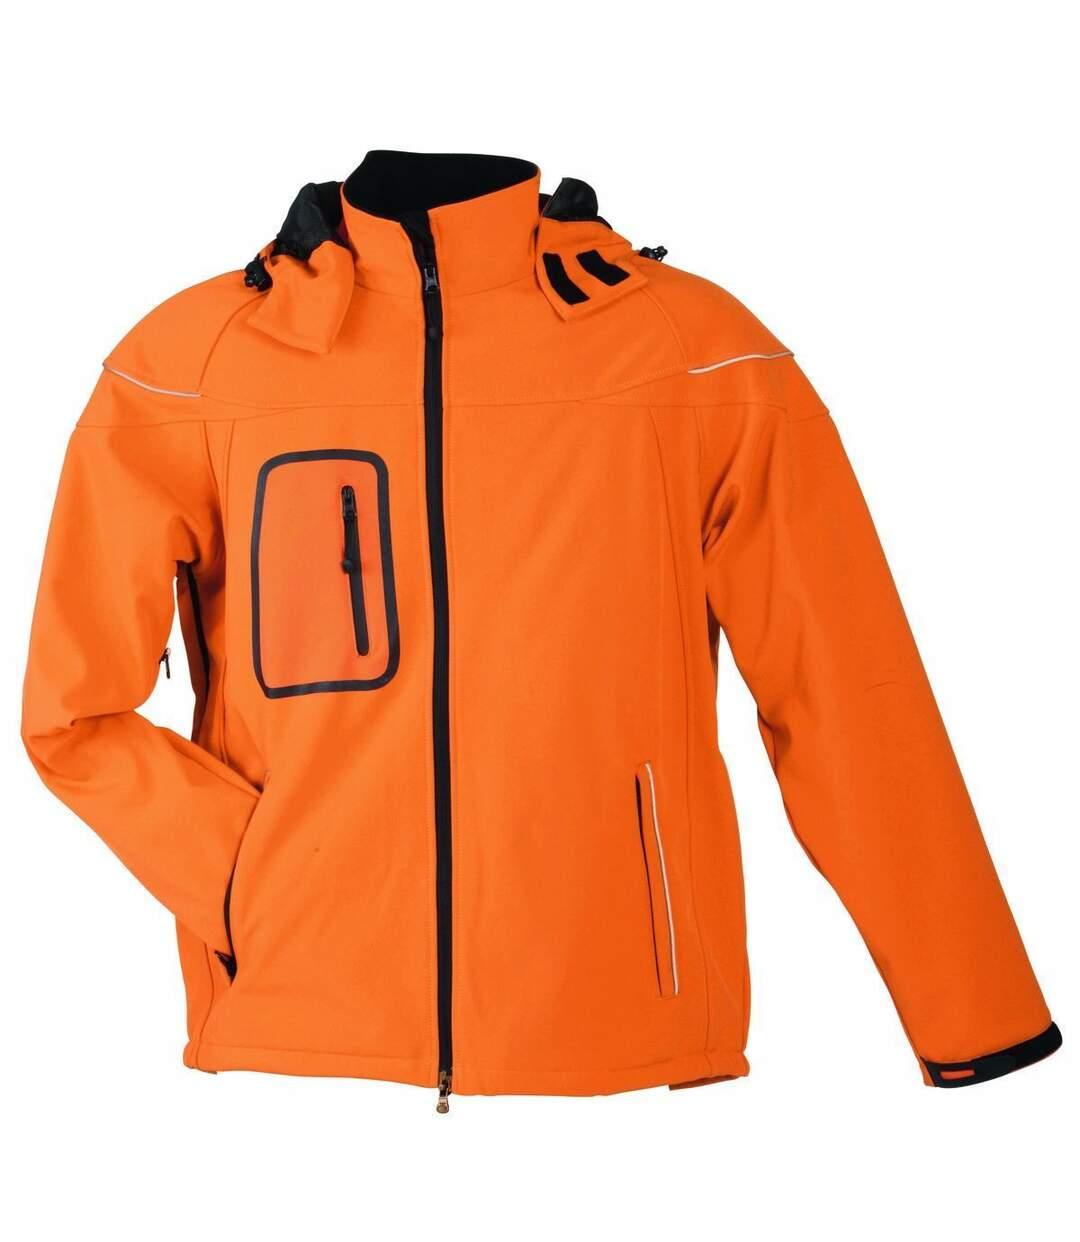 Veste softshell hiver Homme - JN1000 - Orange